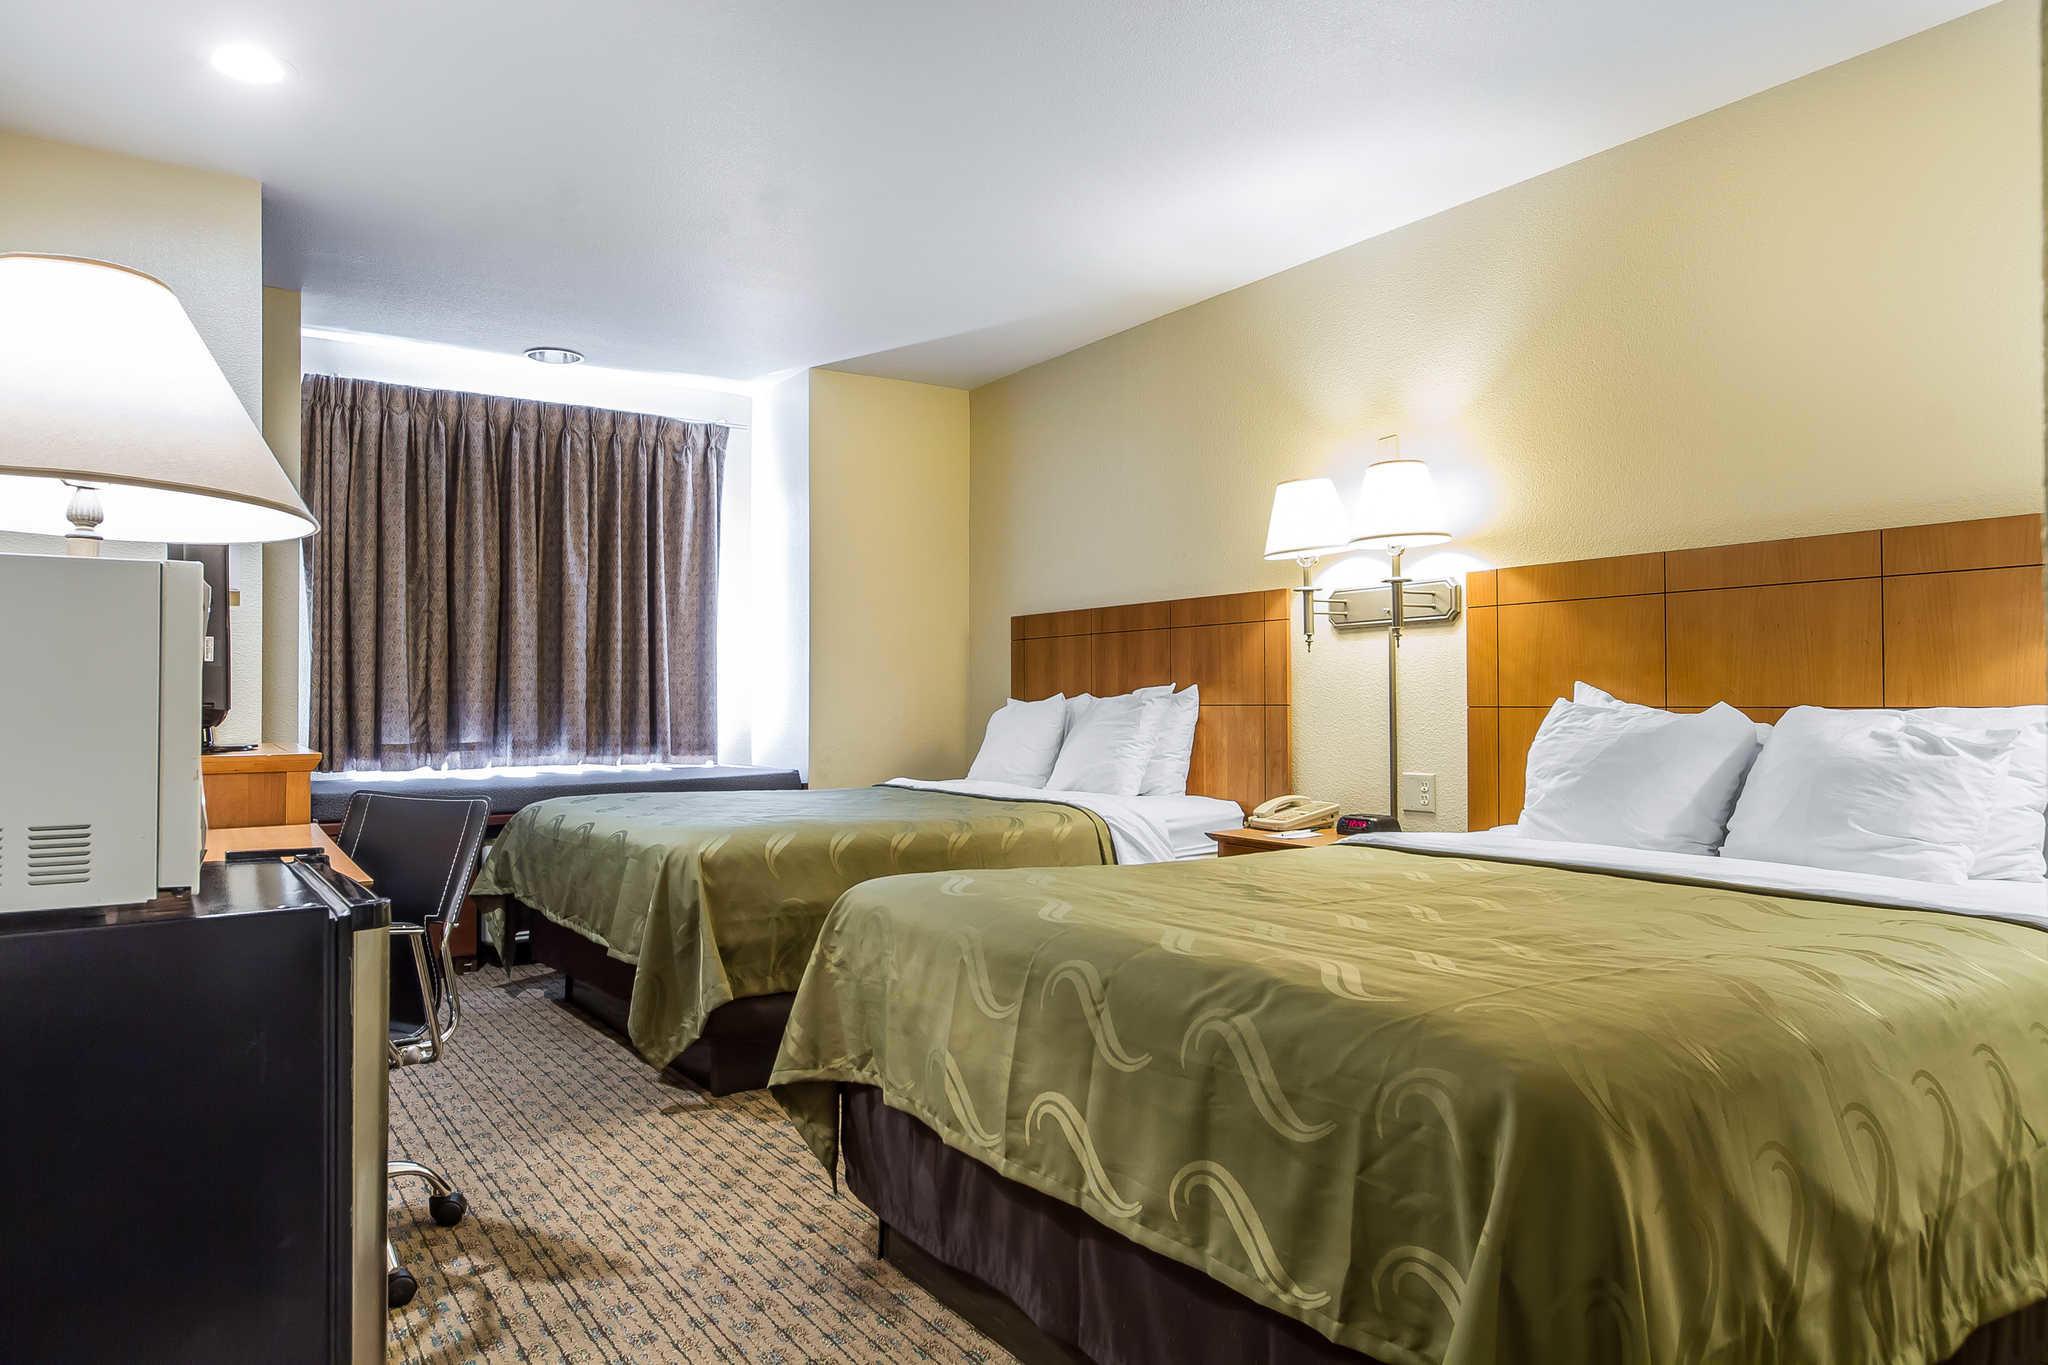 Quality Inn Suites At 3000 Santa Rosa Ave Santa Rosa